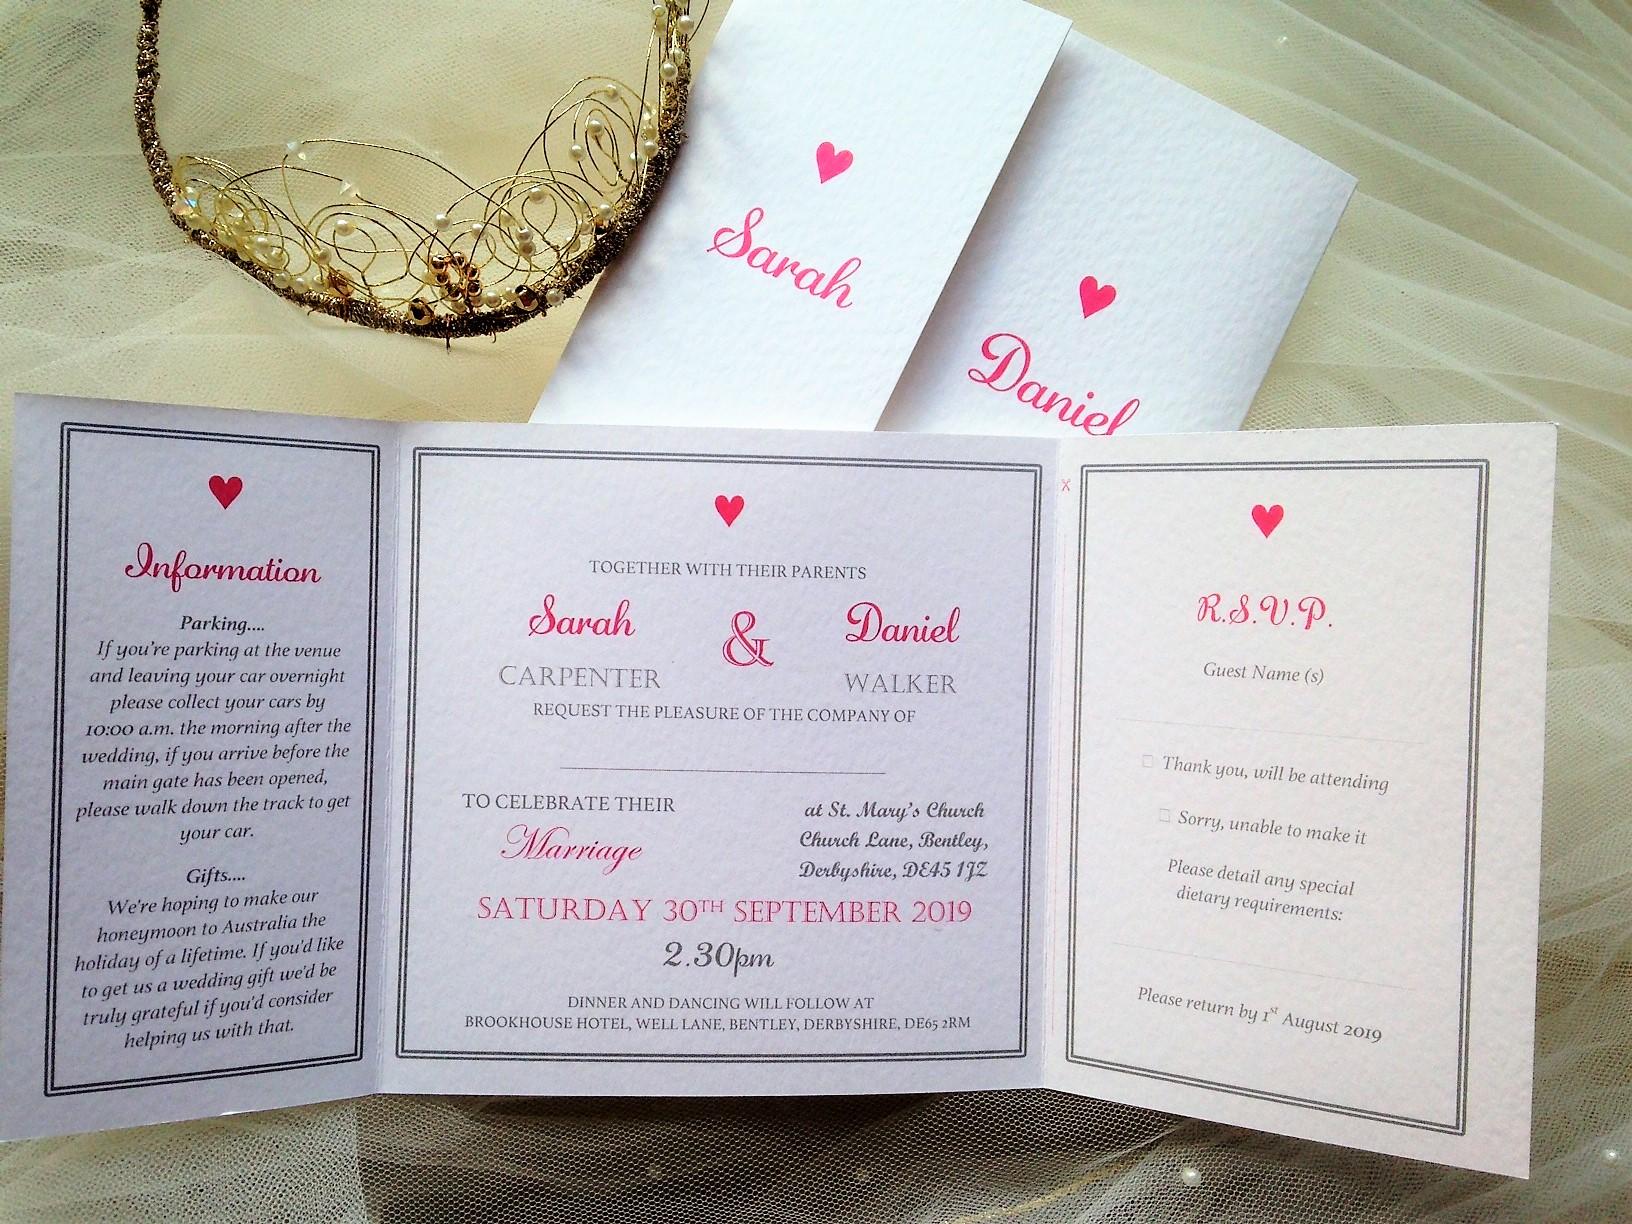 York Wedding Invitations - Daisy Chain Invites